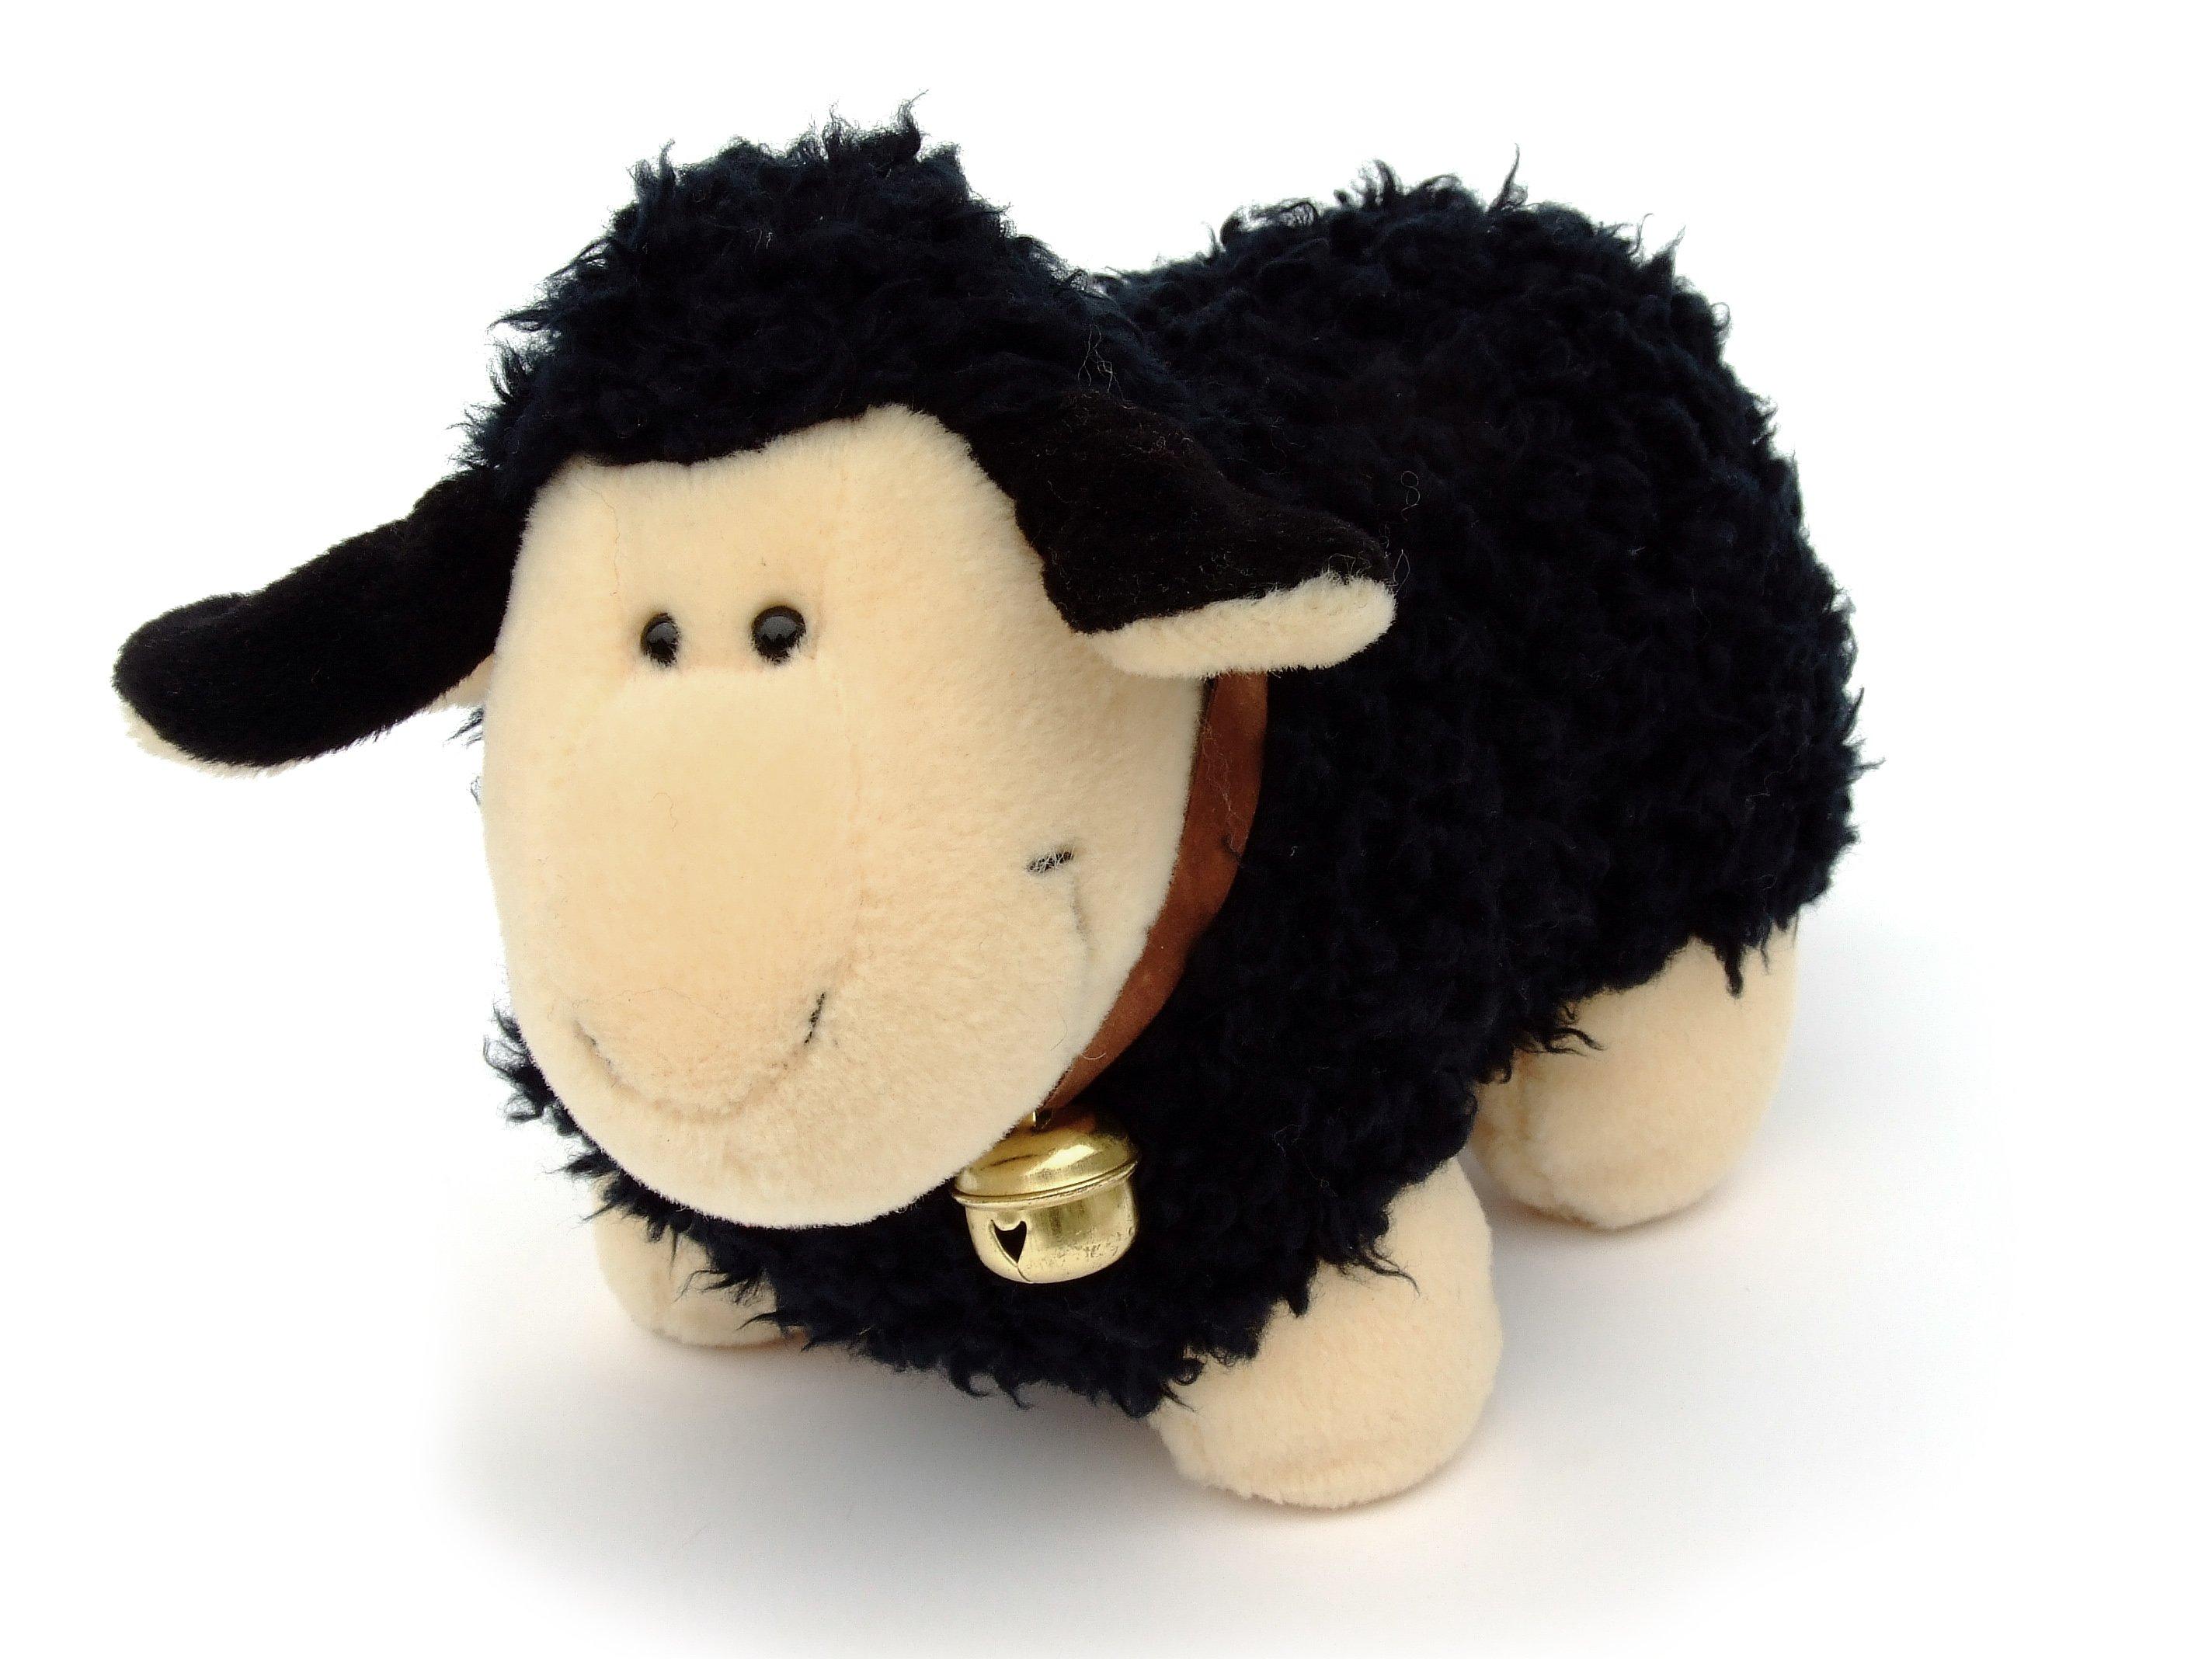 Baa Baa The Black Sheep Moral Stories That Enlighten Book Reviews